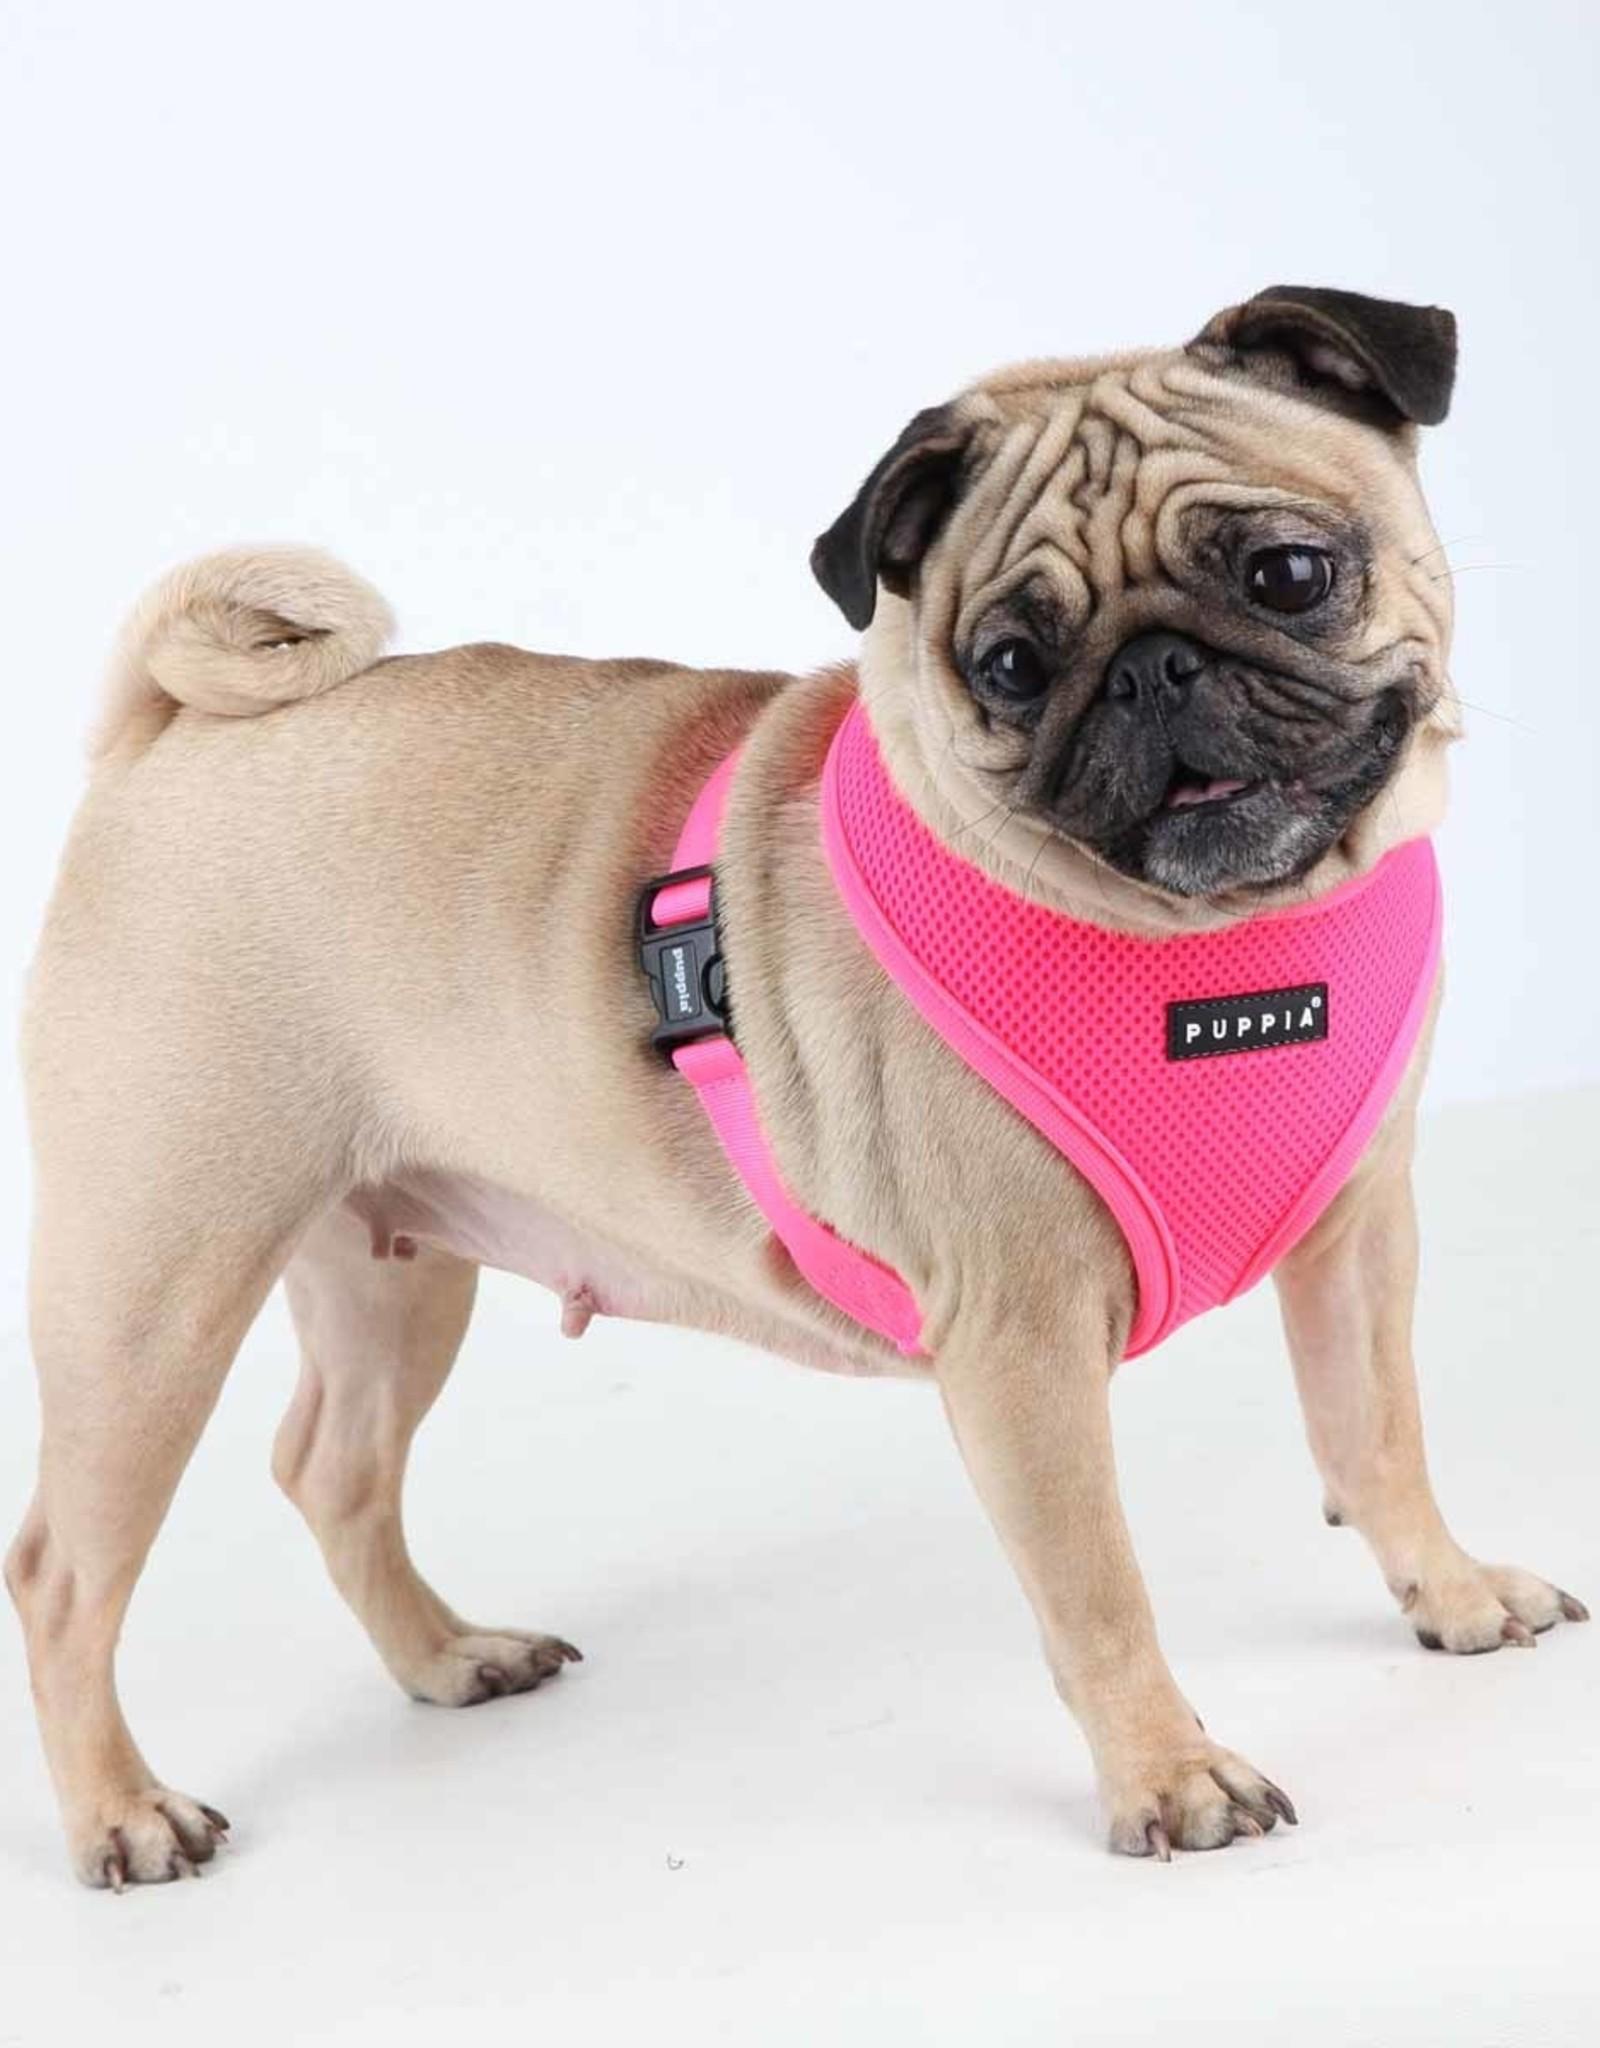 Puppia Puppia Neon Pink Harness